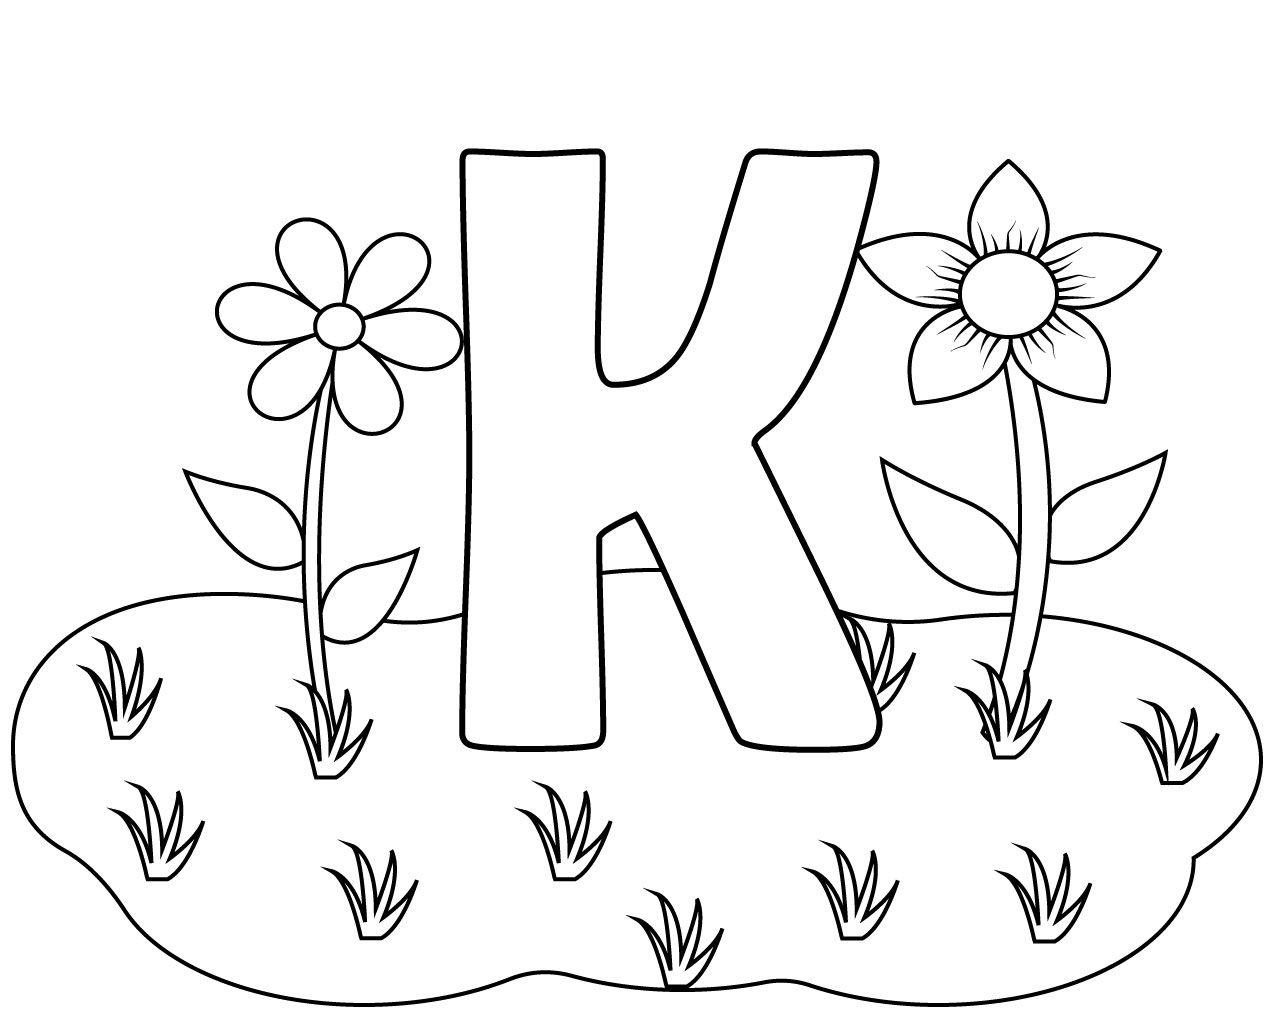 Preschool Letter K Coloring Pages Kindergarten Coloring Pages Coloring Pages Printable Letters